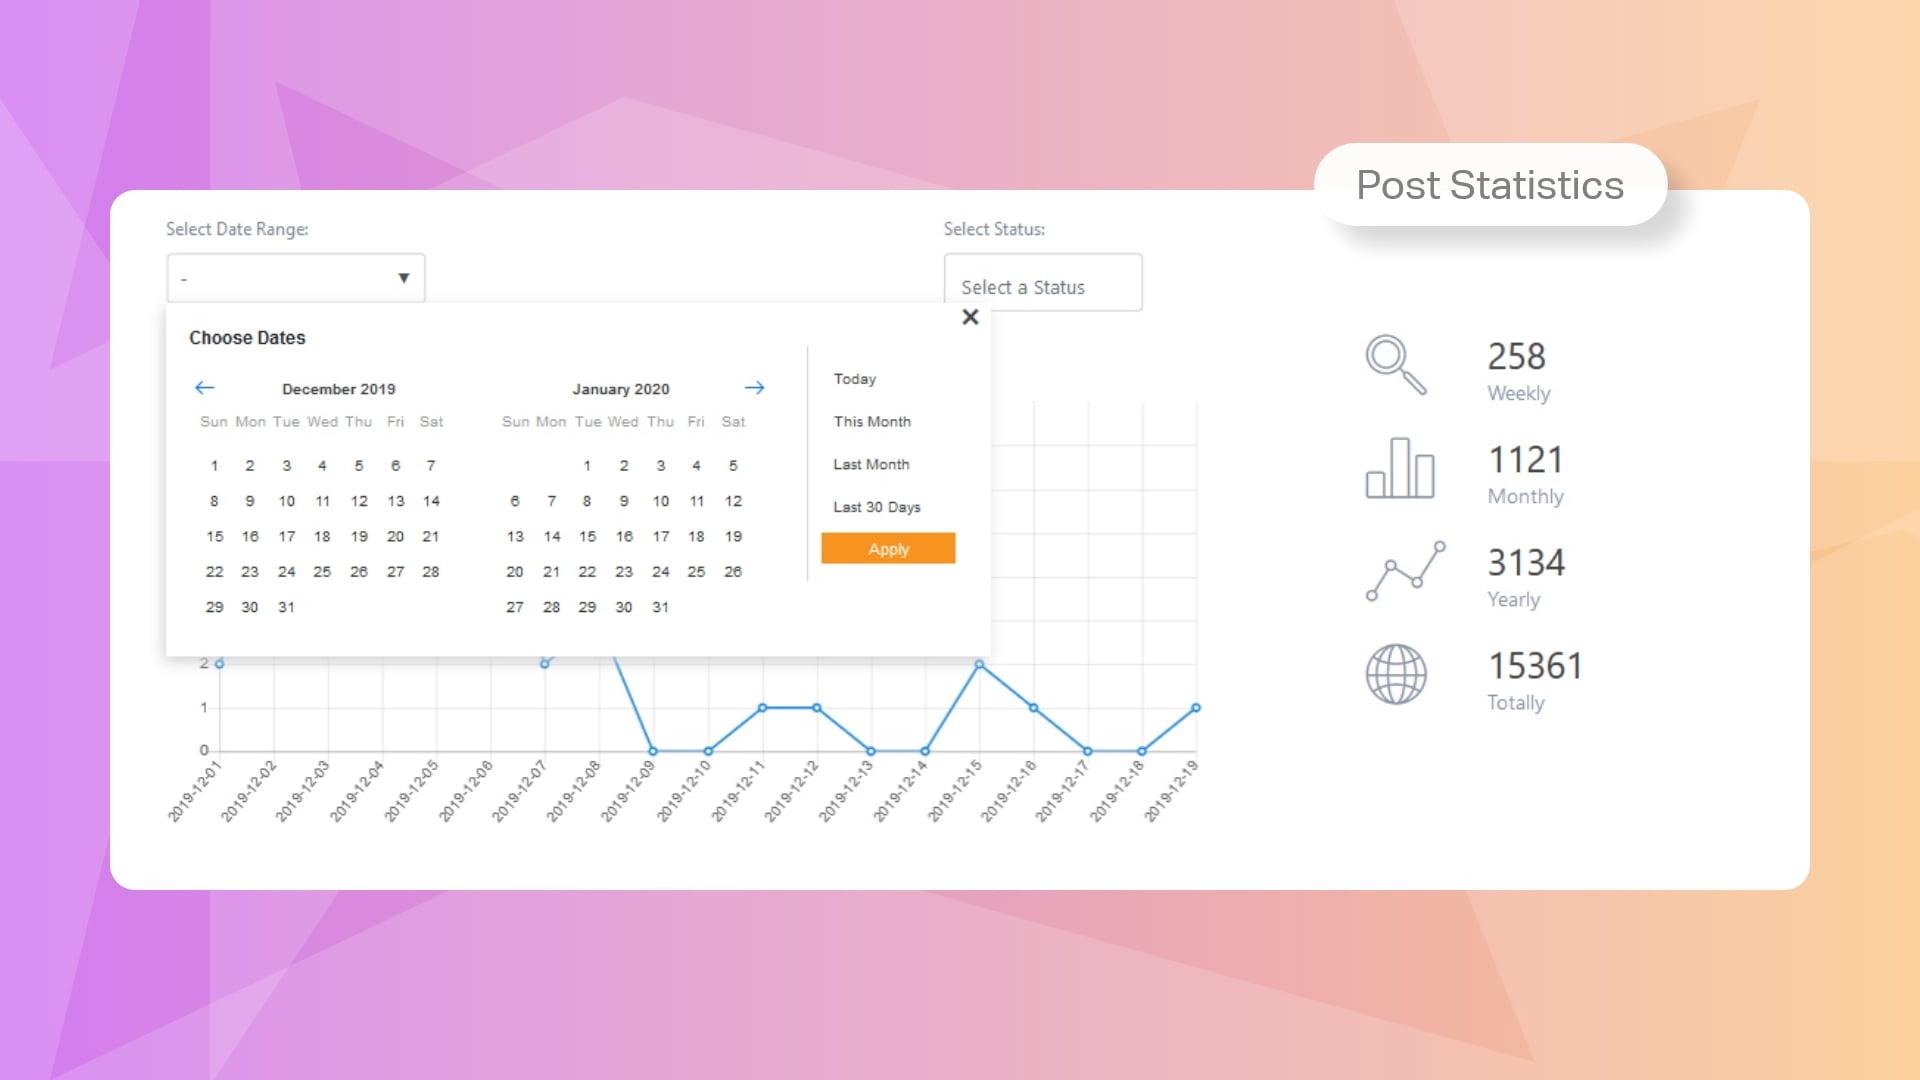 WP ULike Pro Post statistics - Date Range